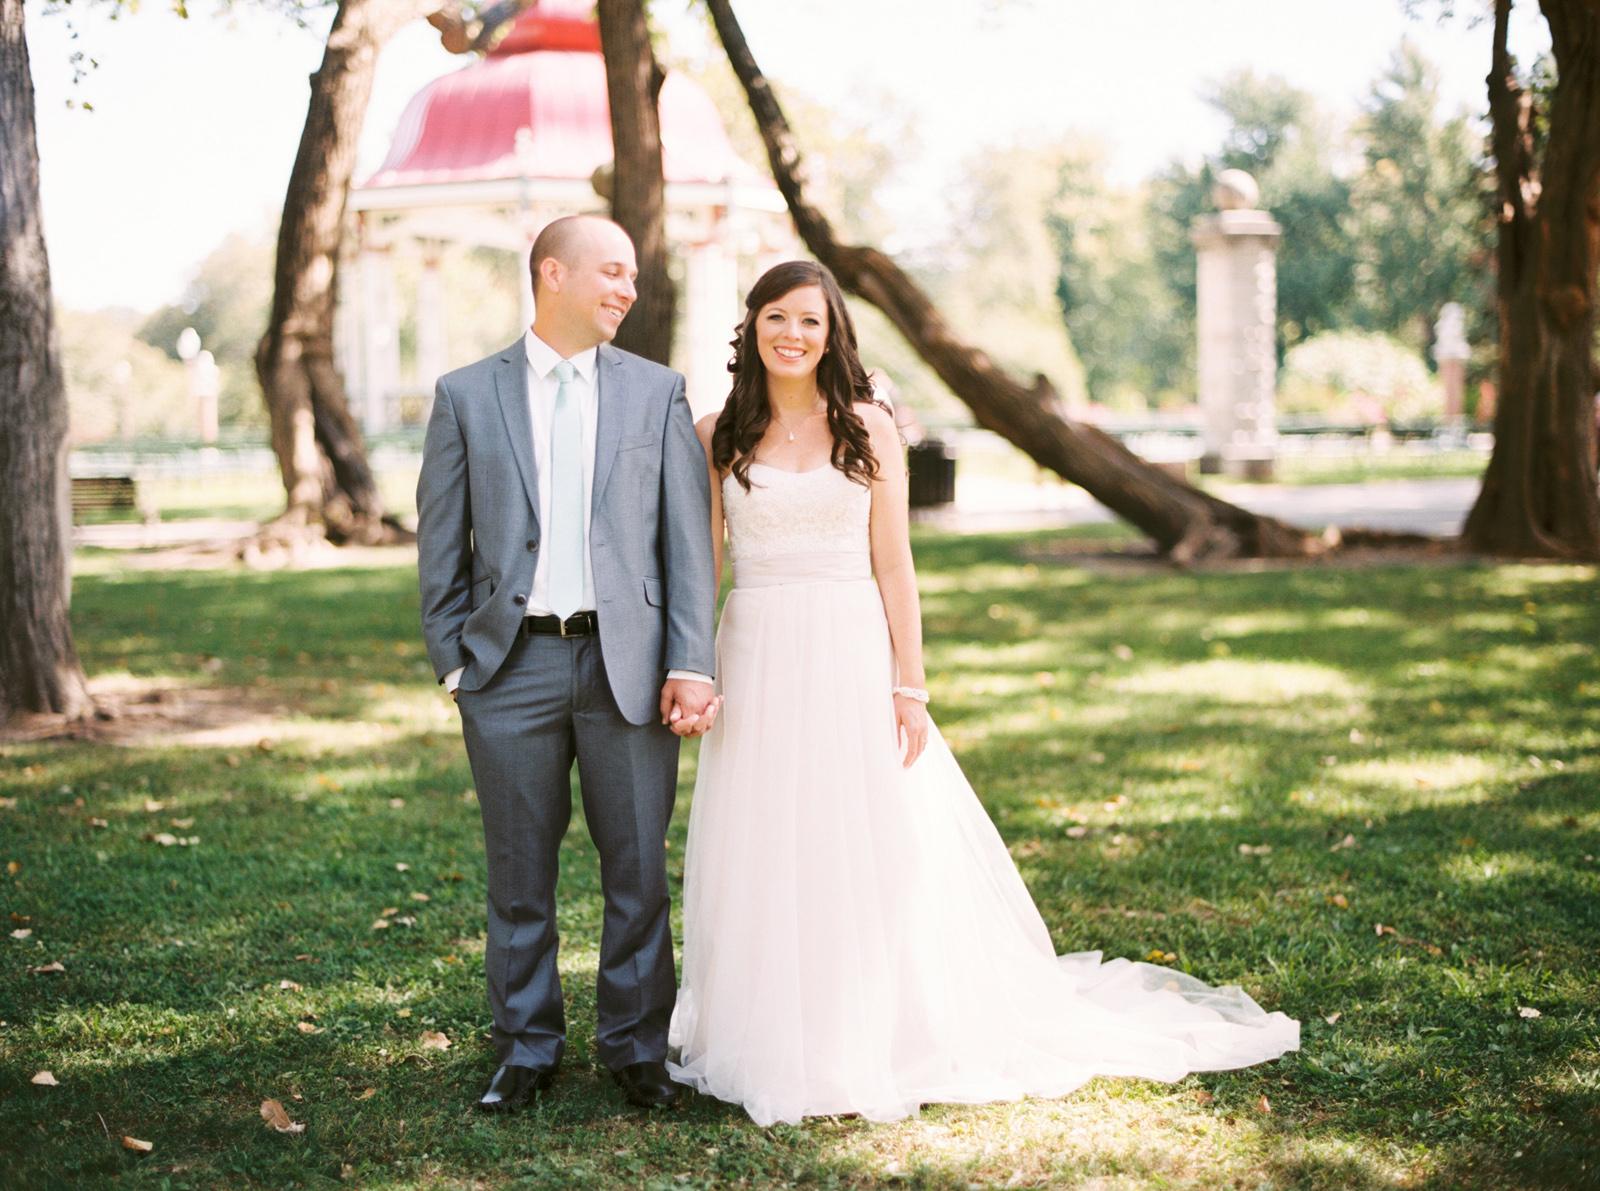 Oldani-Photography-St-Louis-Film-Photographer-Tower-Grove-Park-Wedding-Photographer-Music-Stand-8604_07.jpg